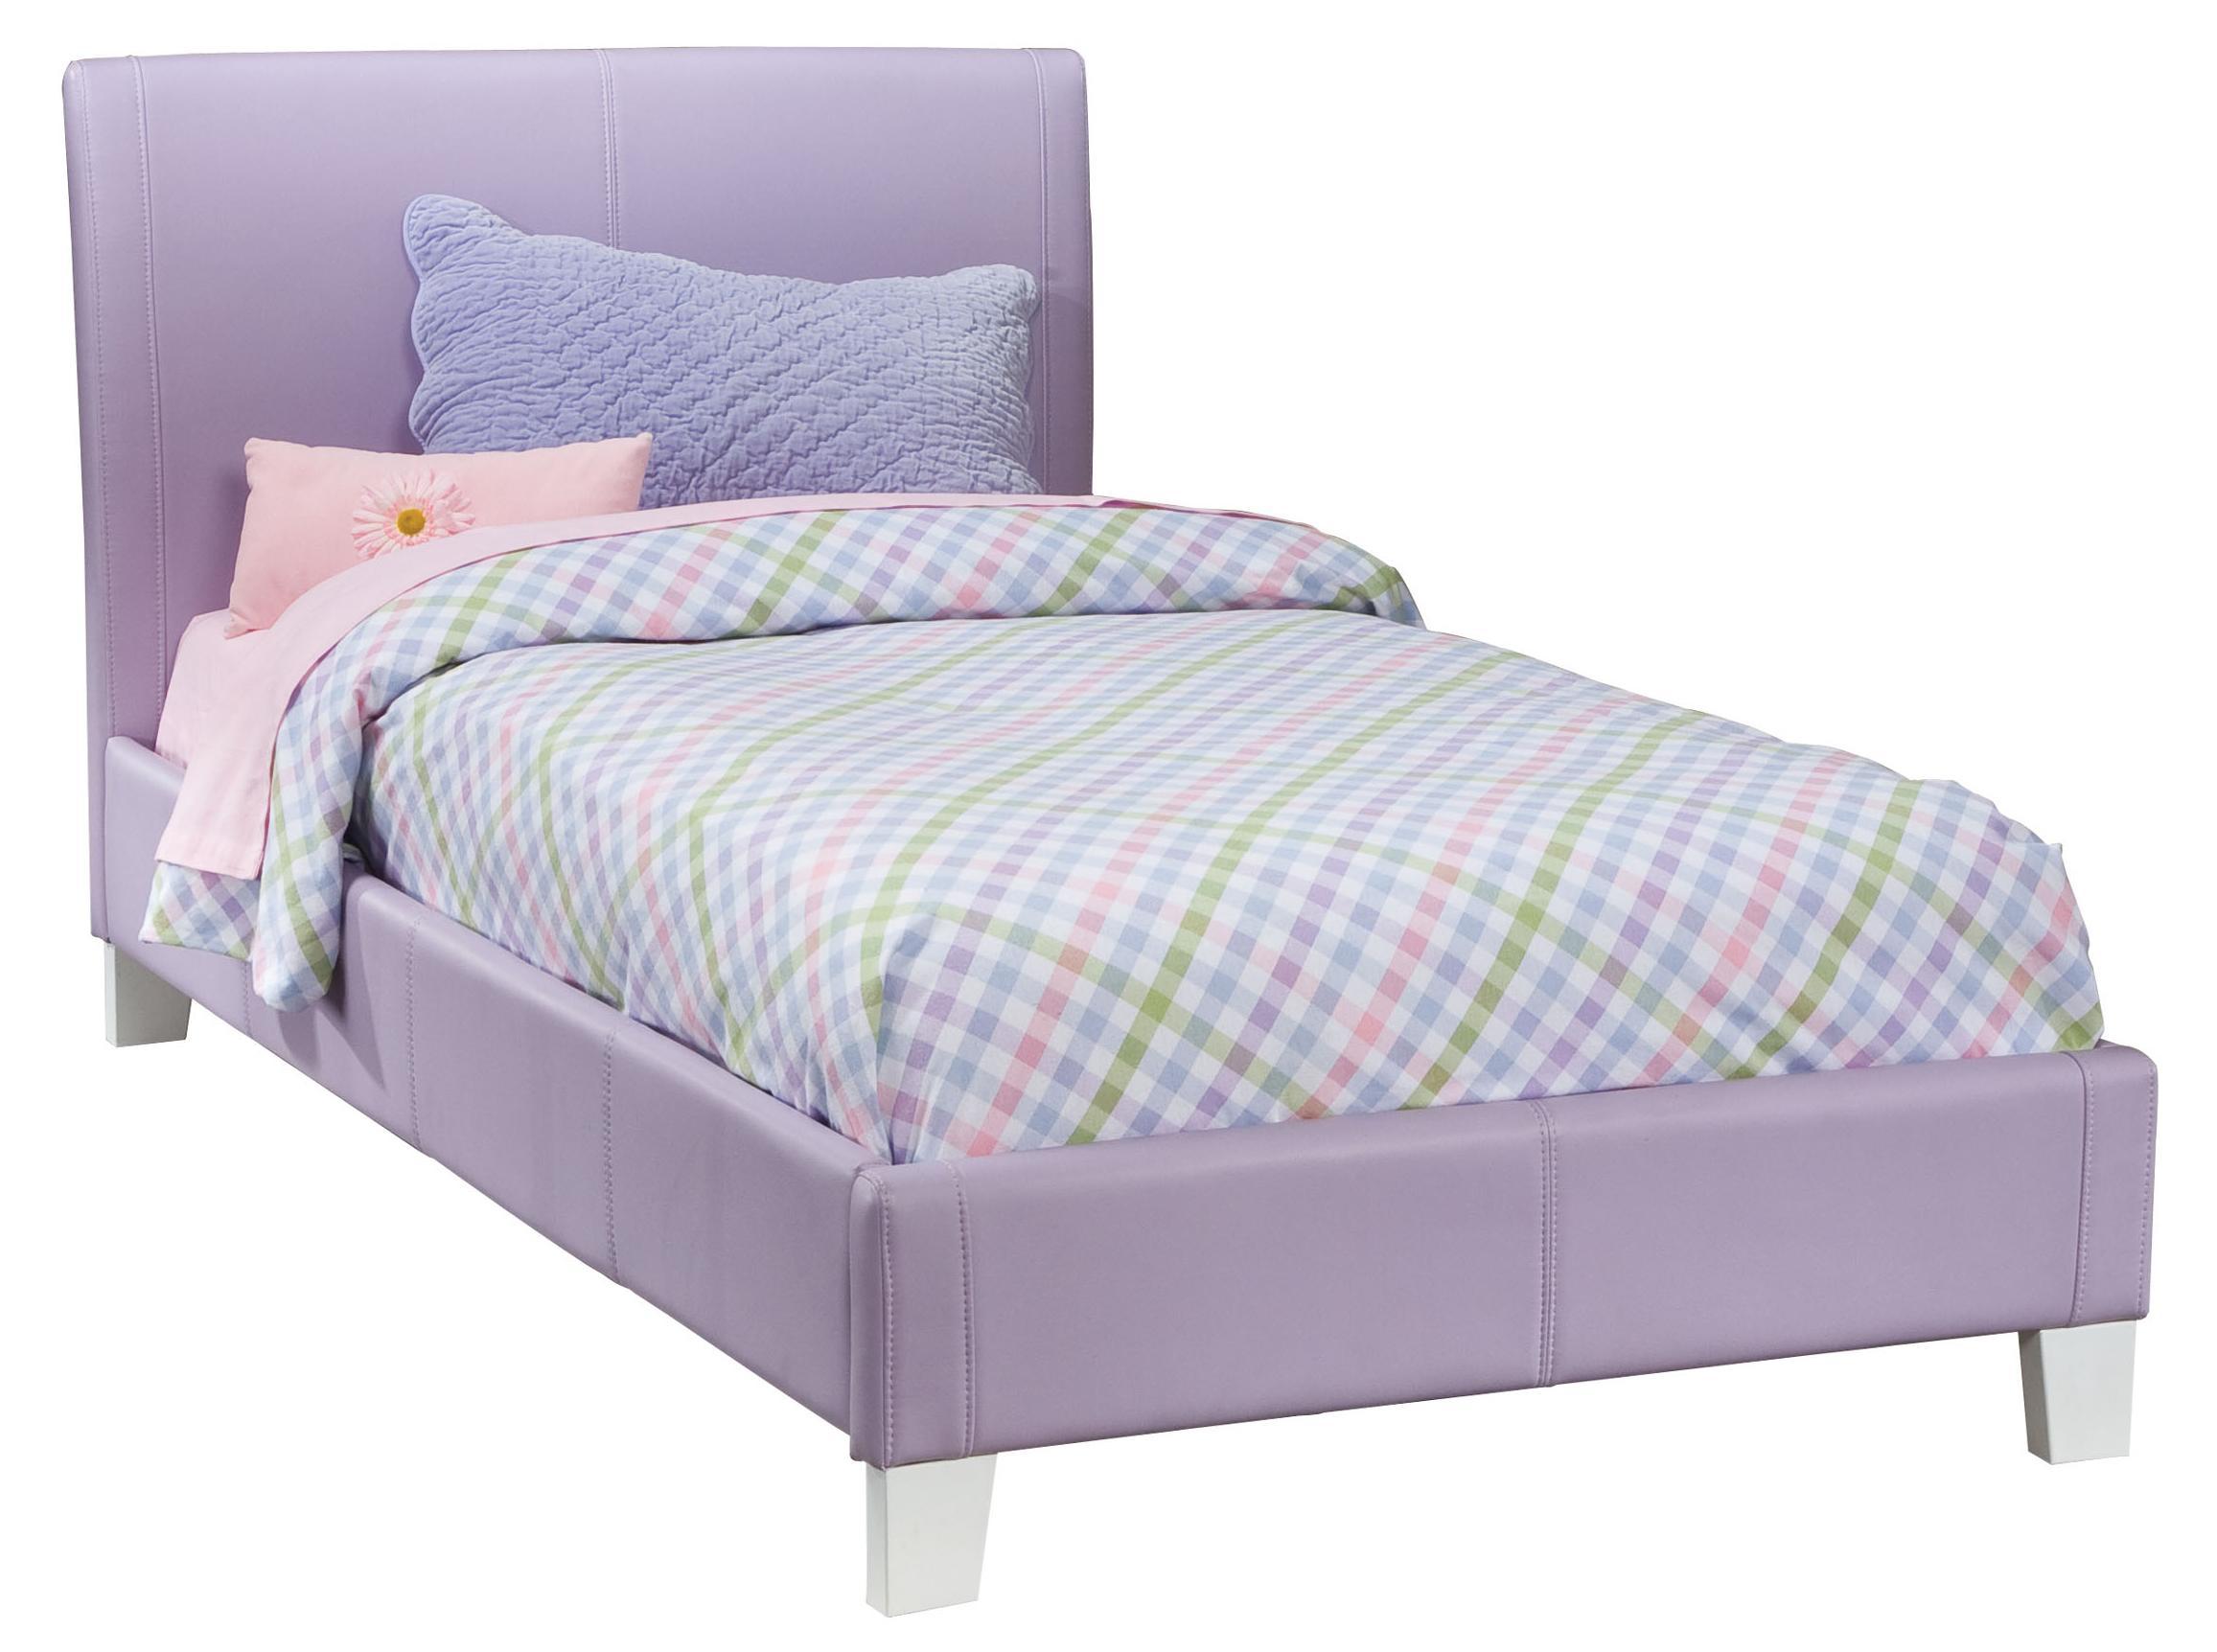 Standard Furniture Fantasia Twin Upholstered Youth Bed Del Sol Furniture Upholstered Bed